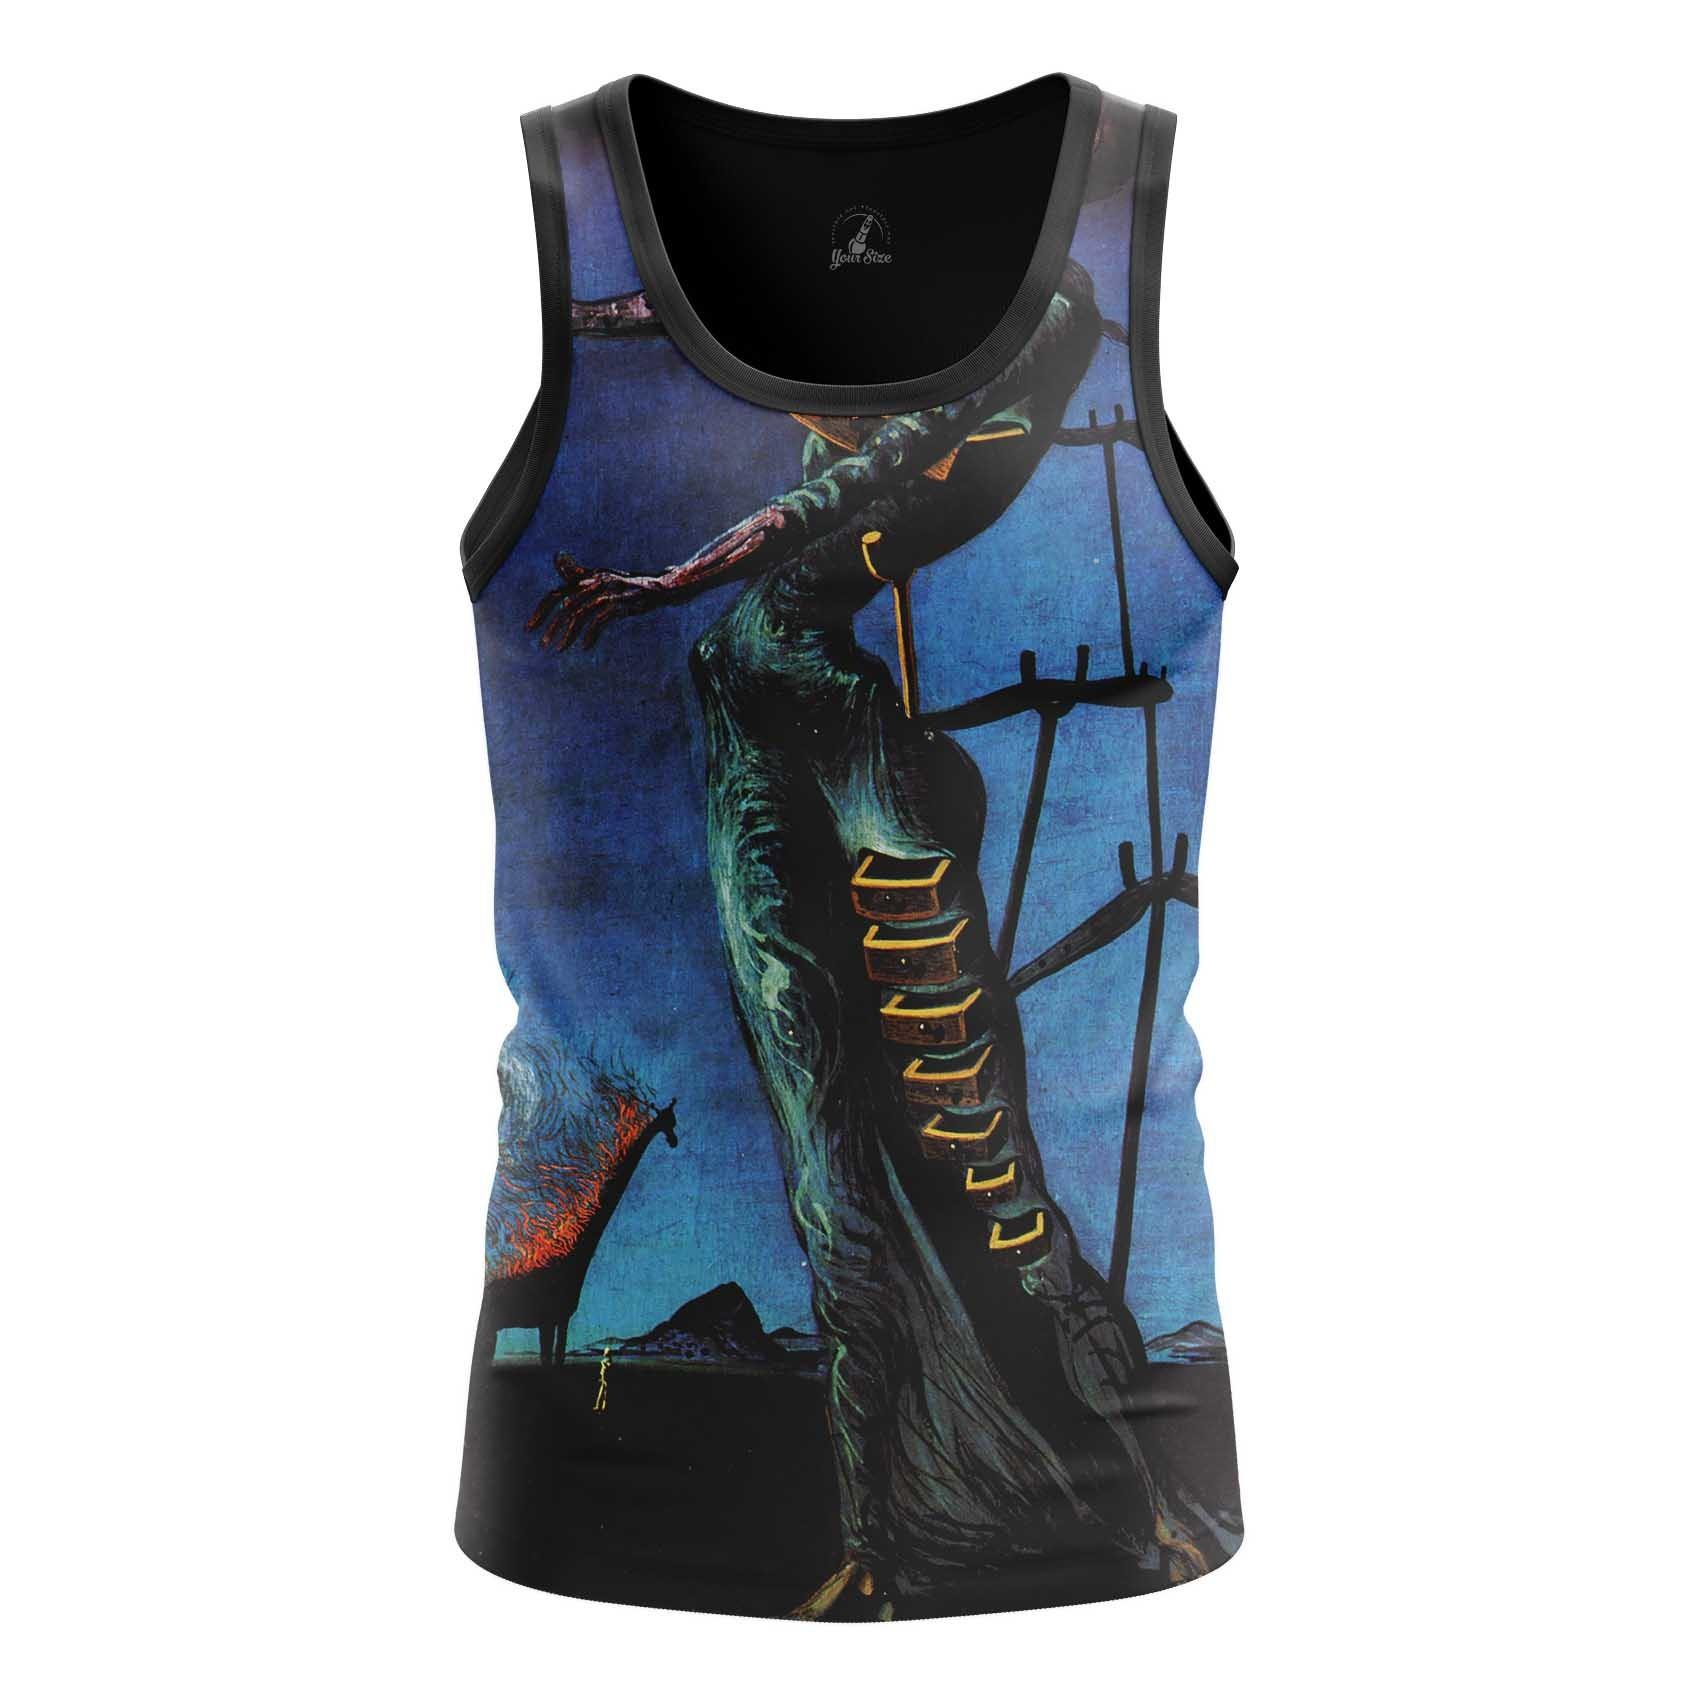 Merchandise T-Shirt Burning Giraffe Salvador Dali